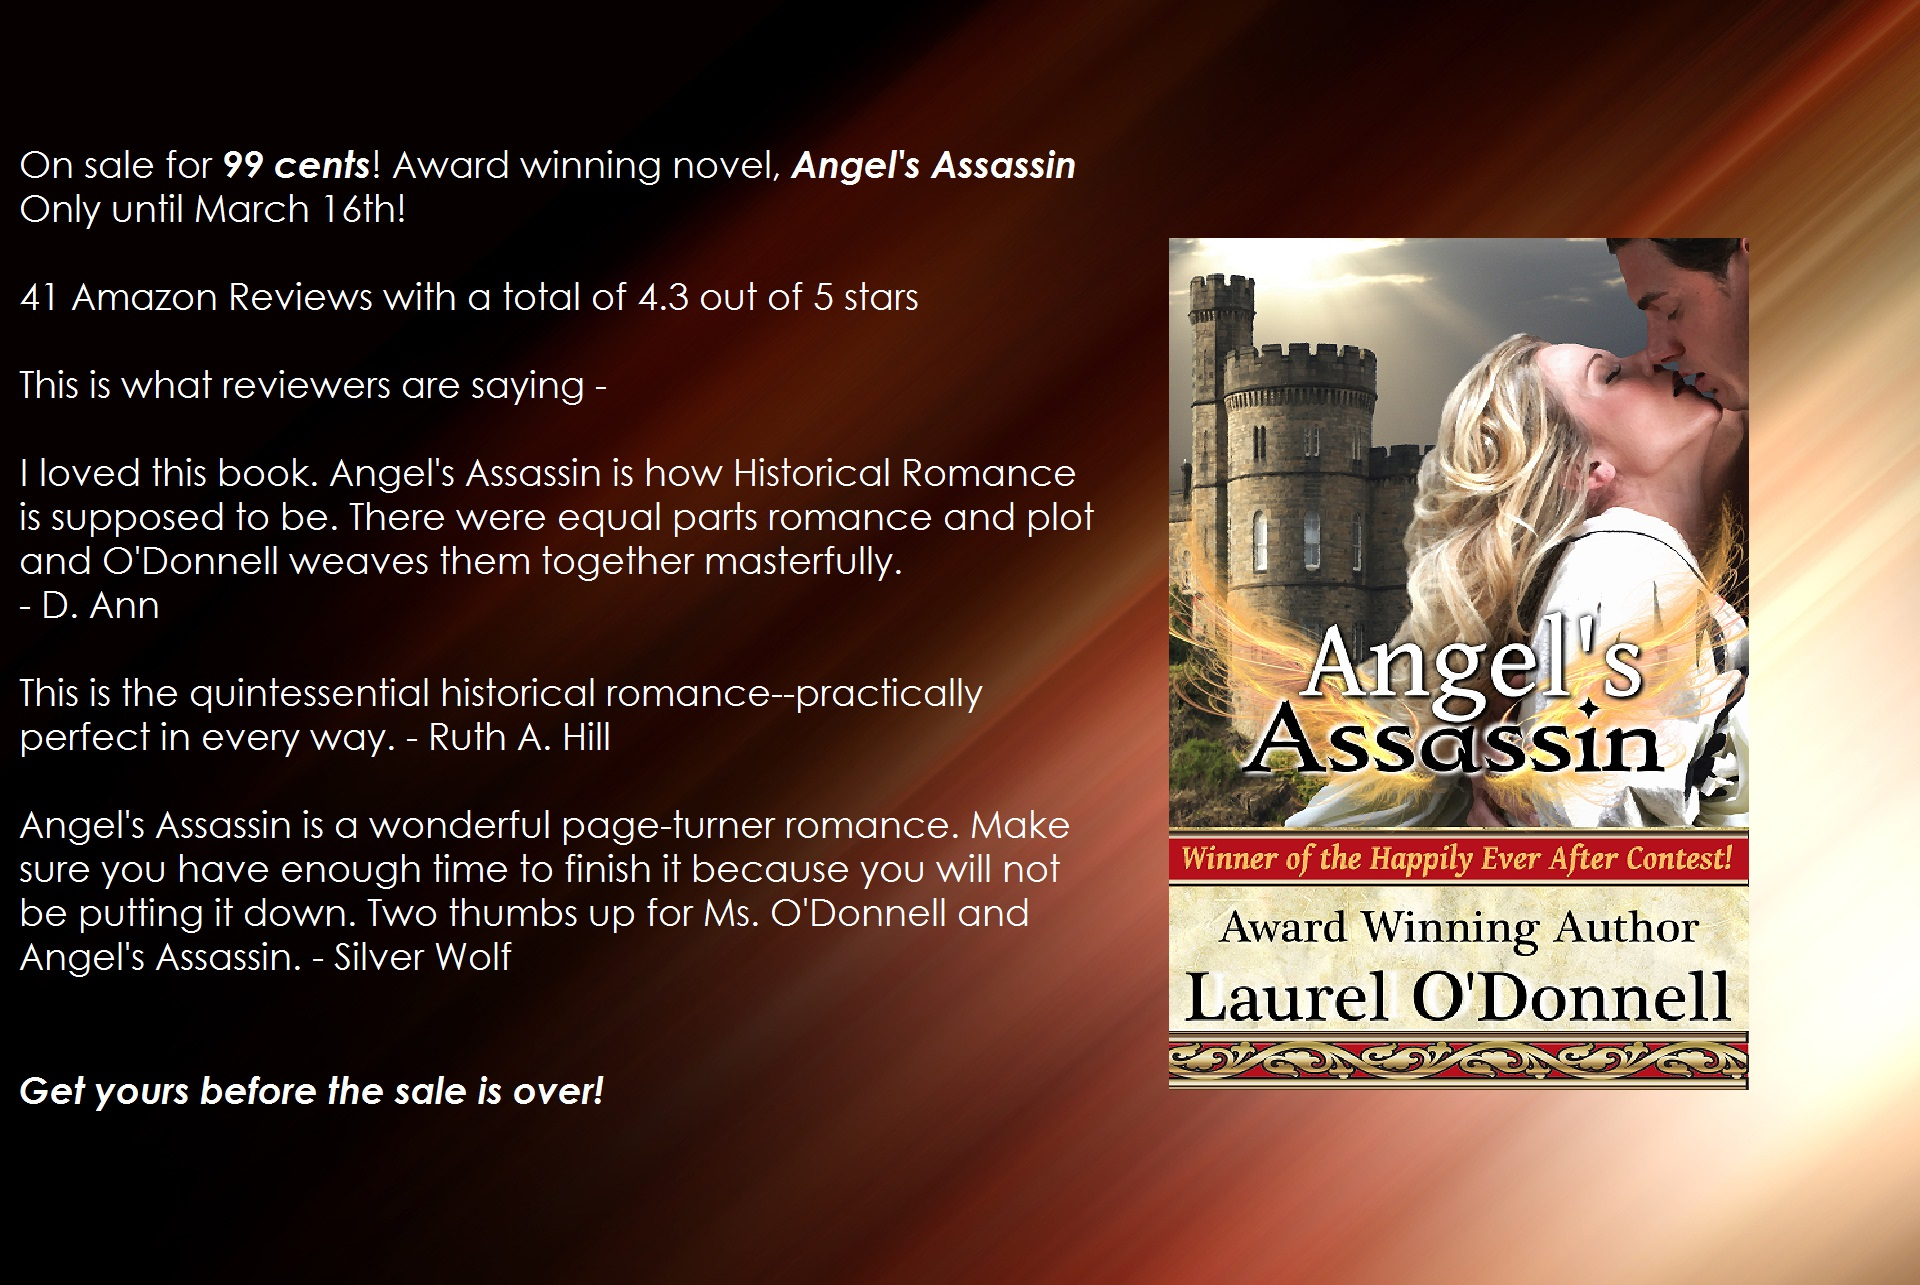 Angel's Assassin sale teaser